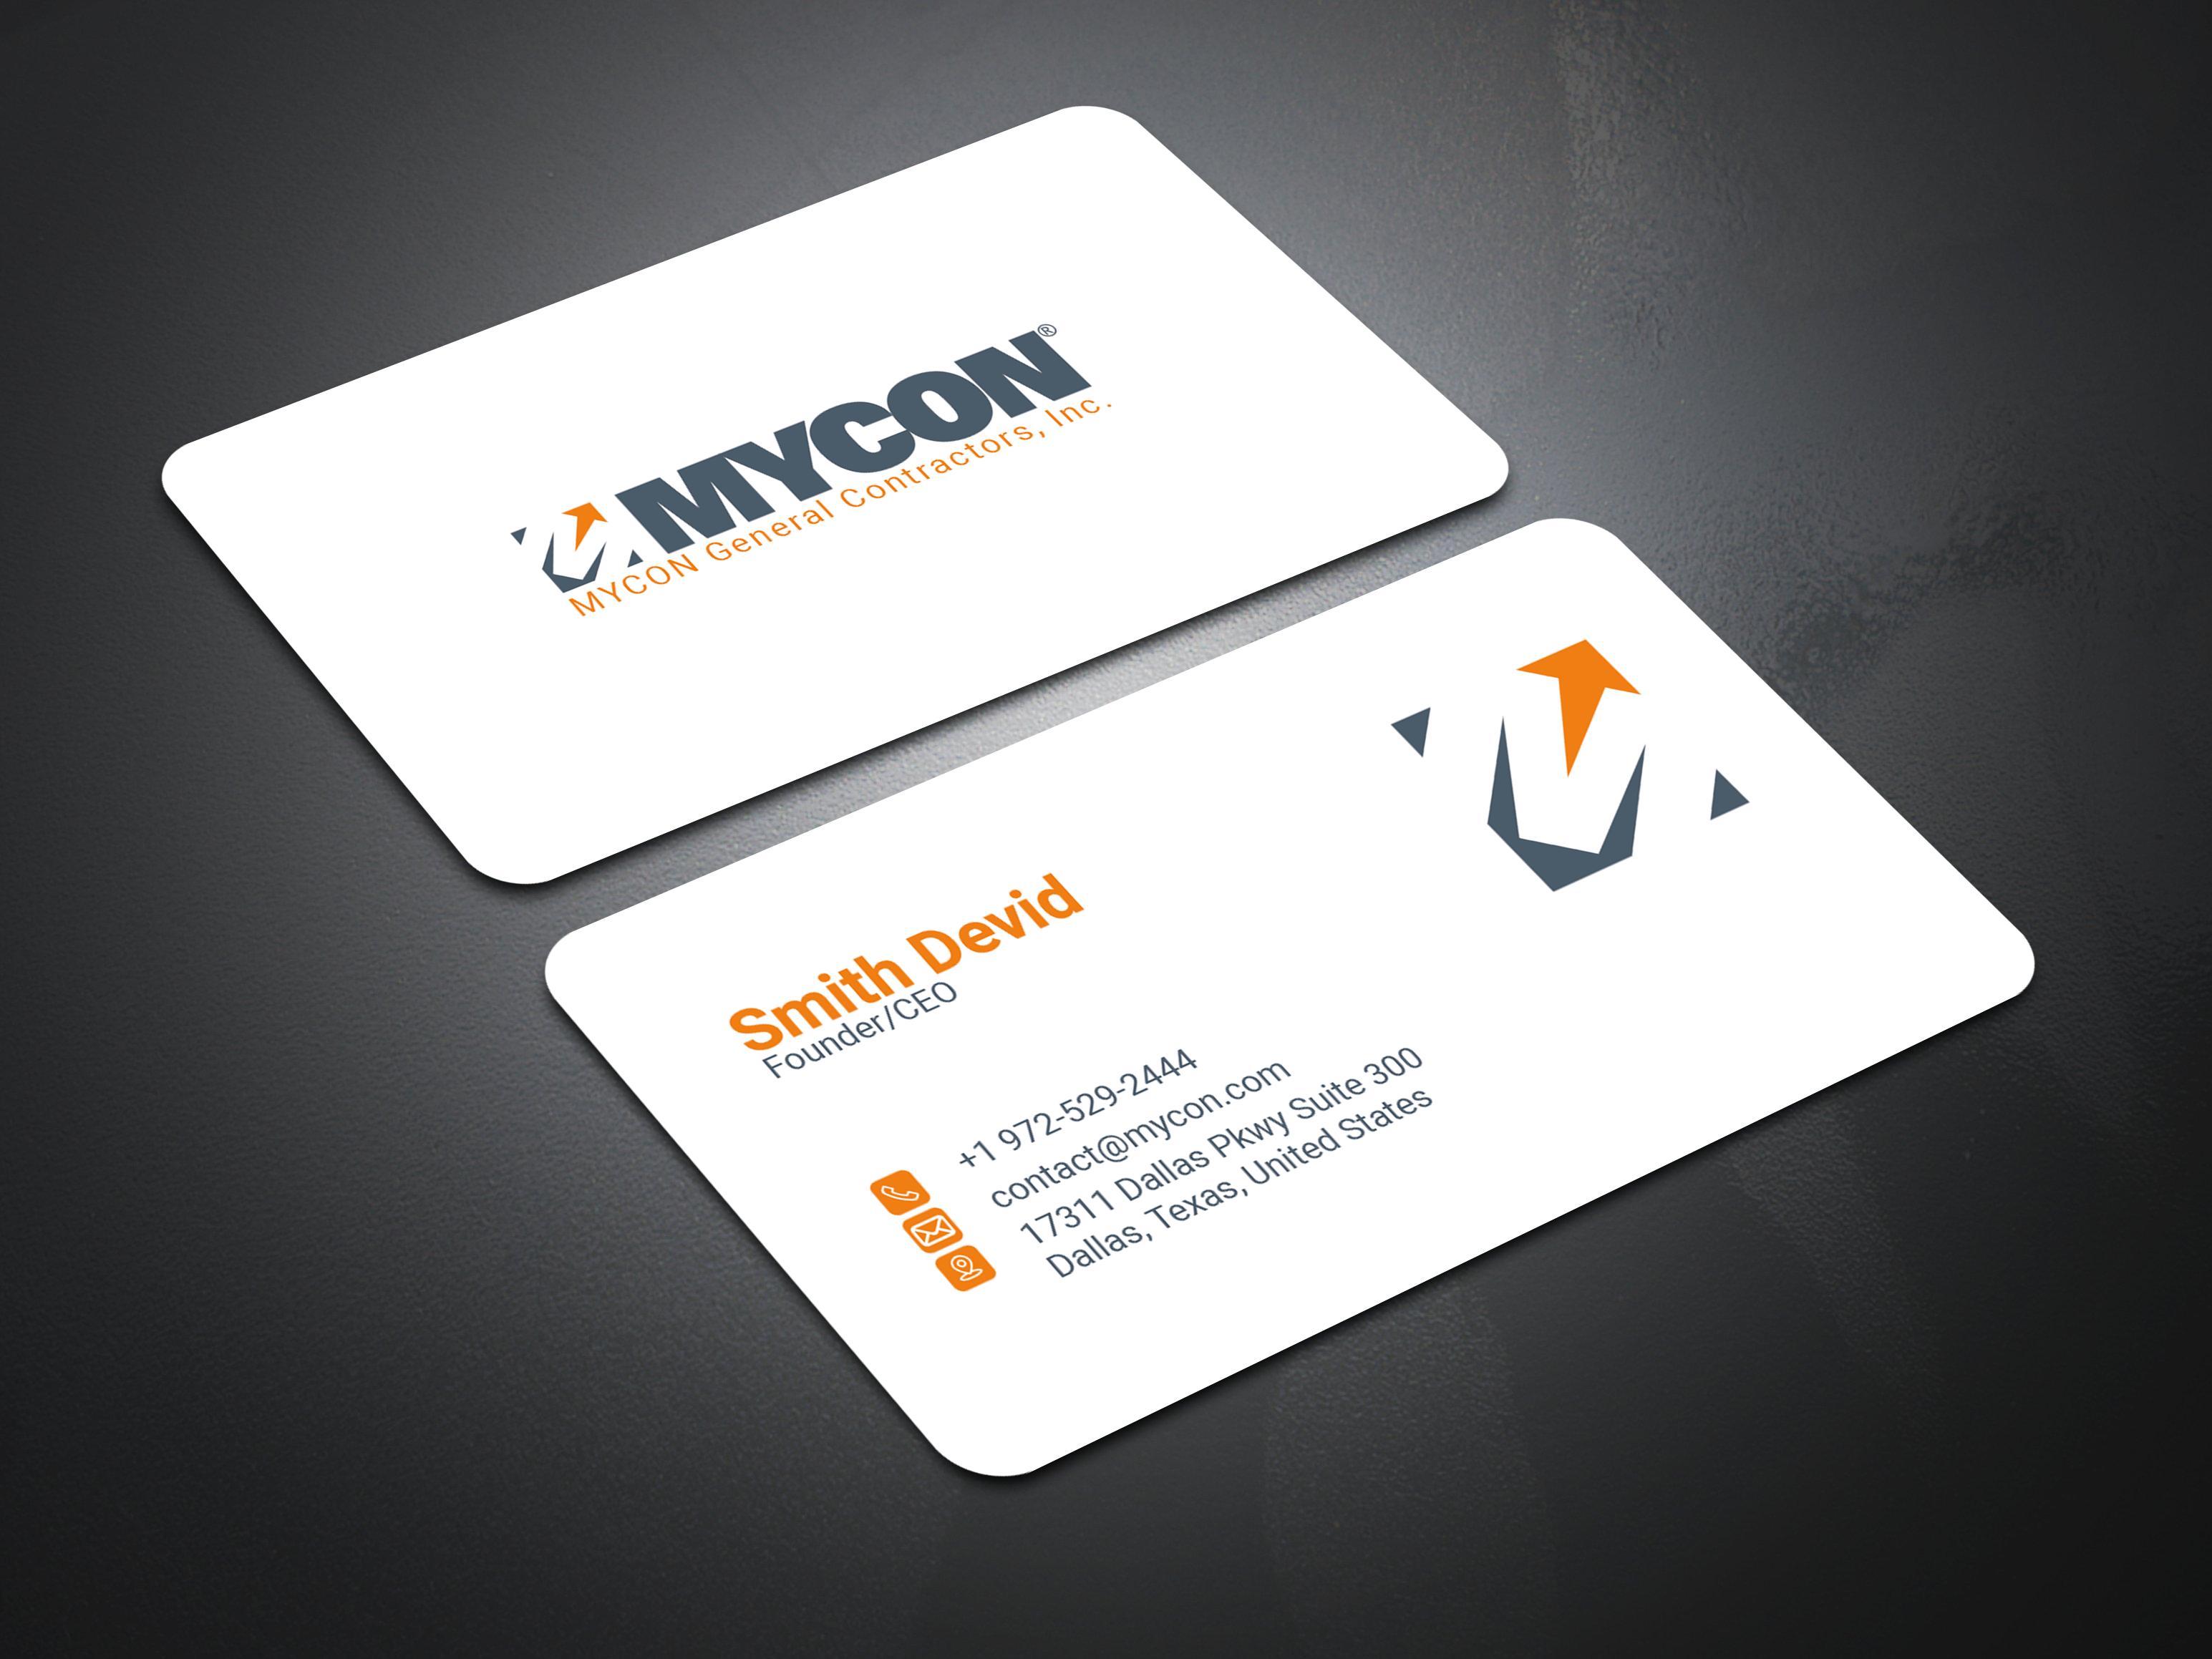 I will design a professional minimalist business card